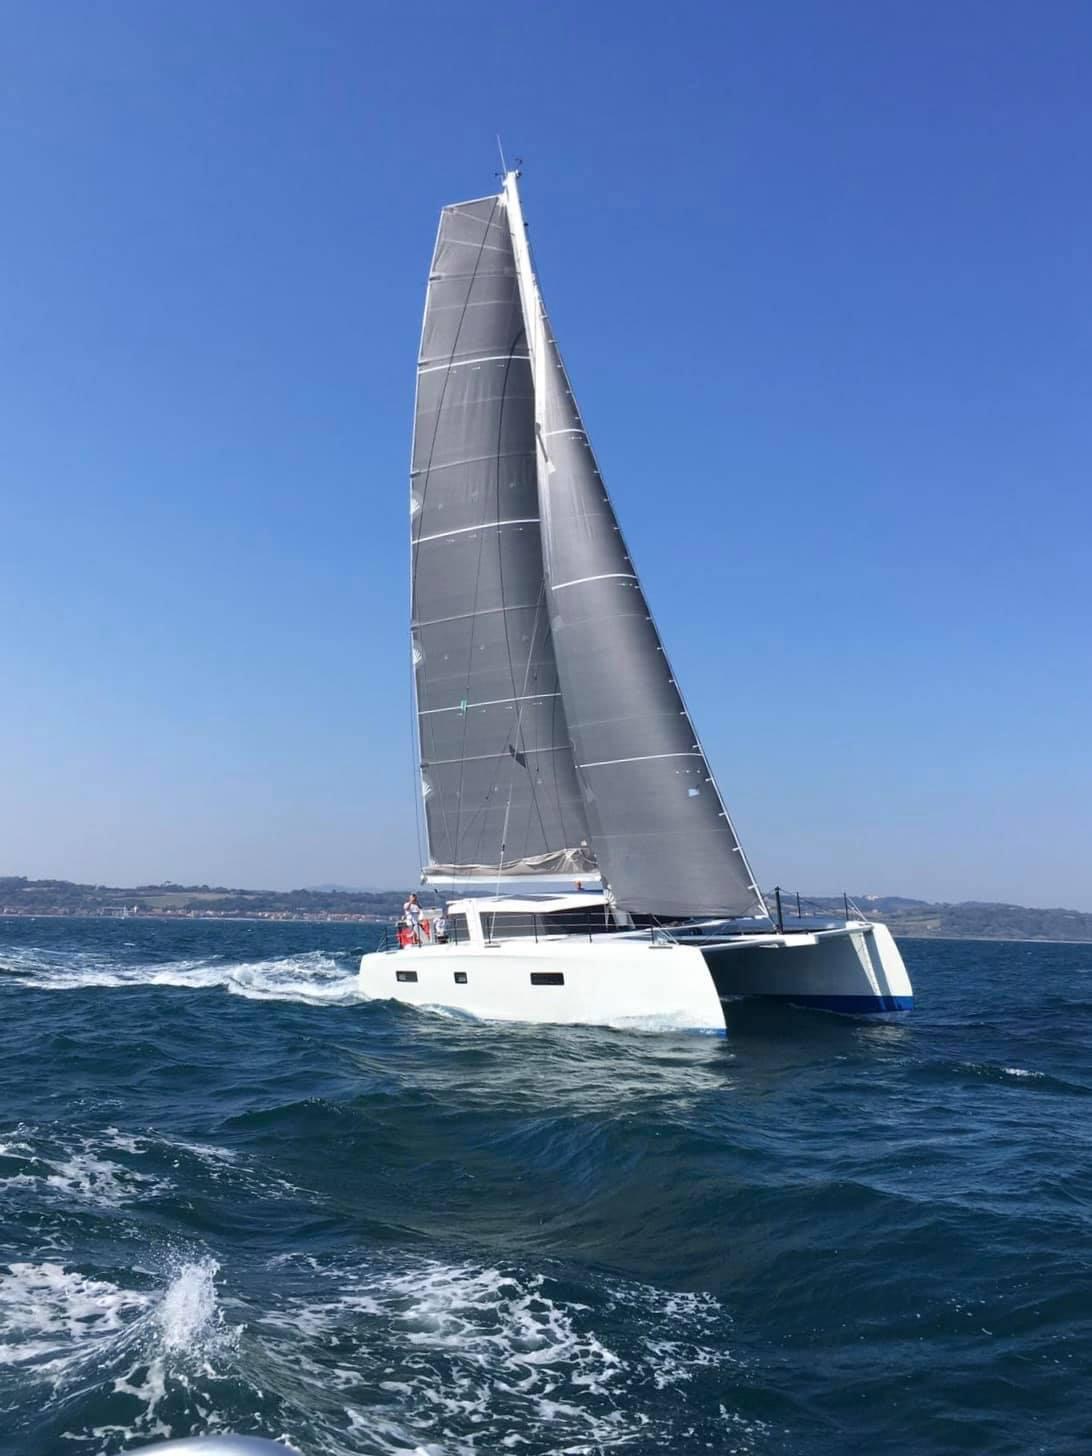 ITA1499 - Yacht Design Collective